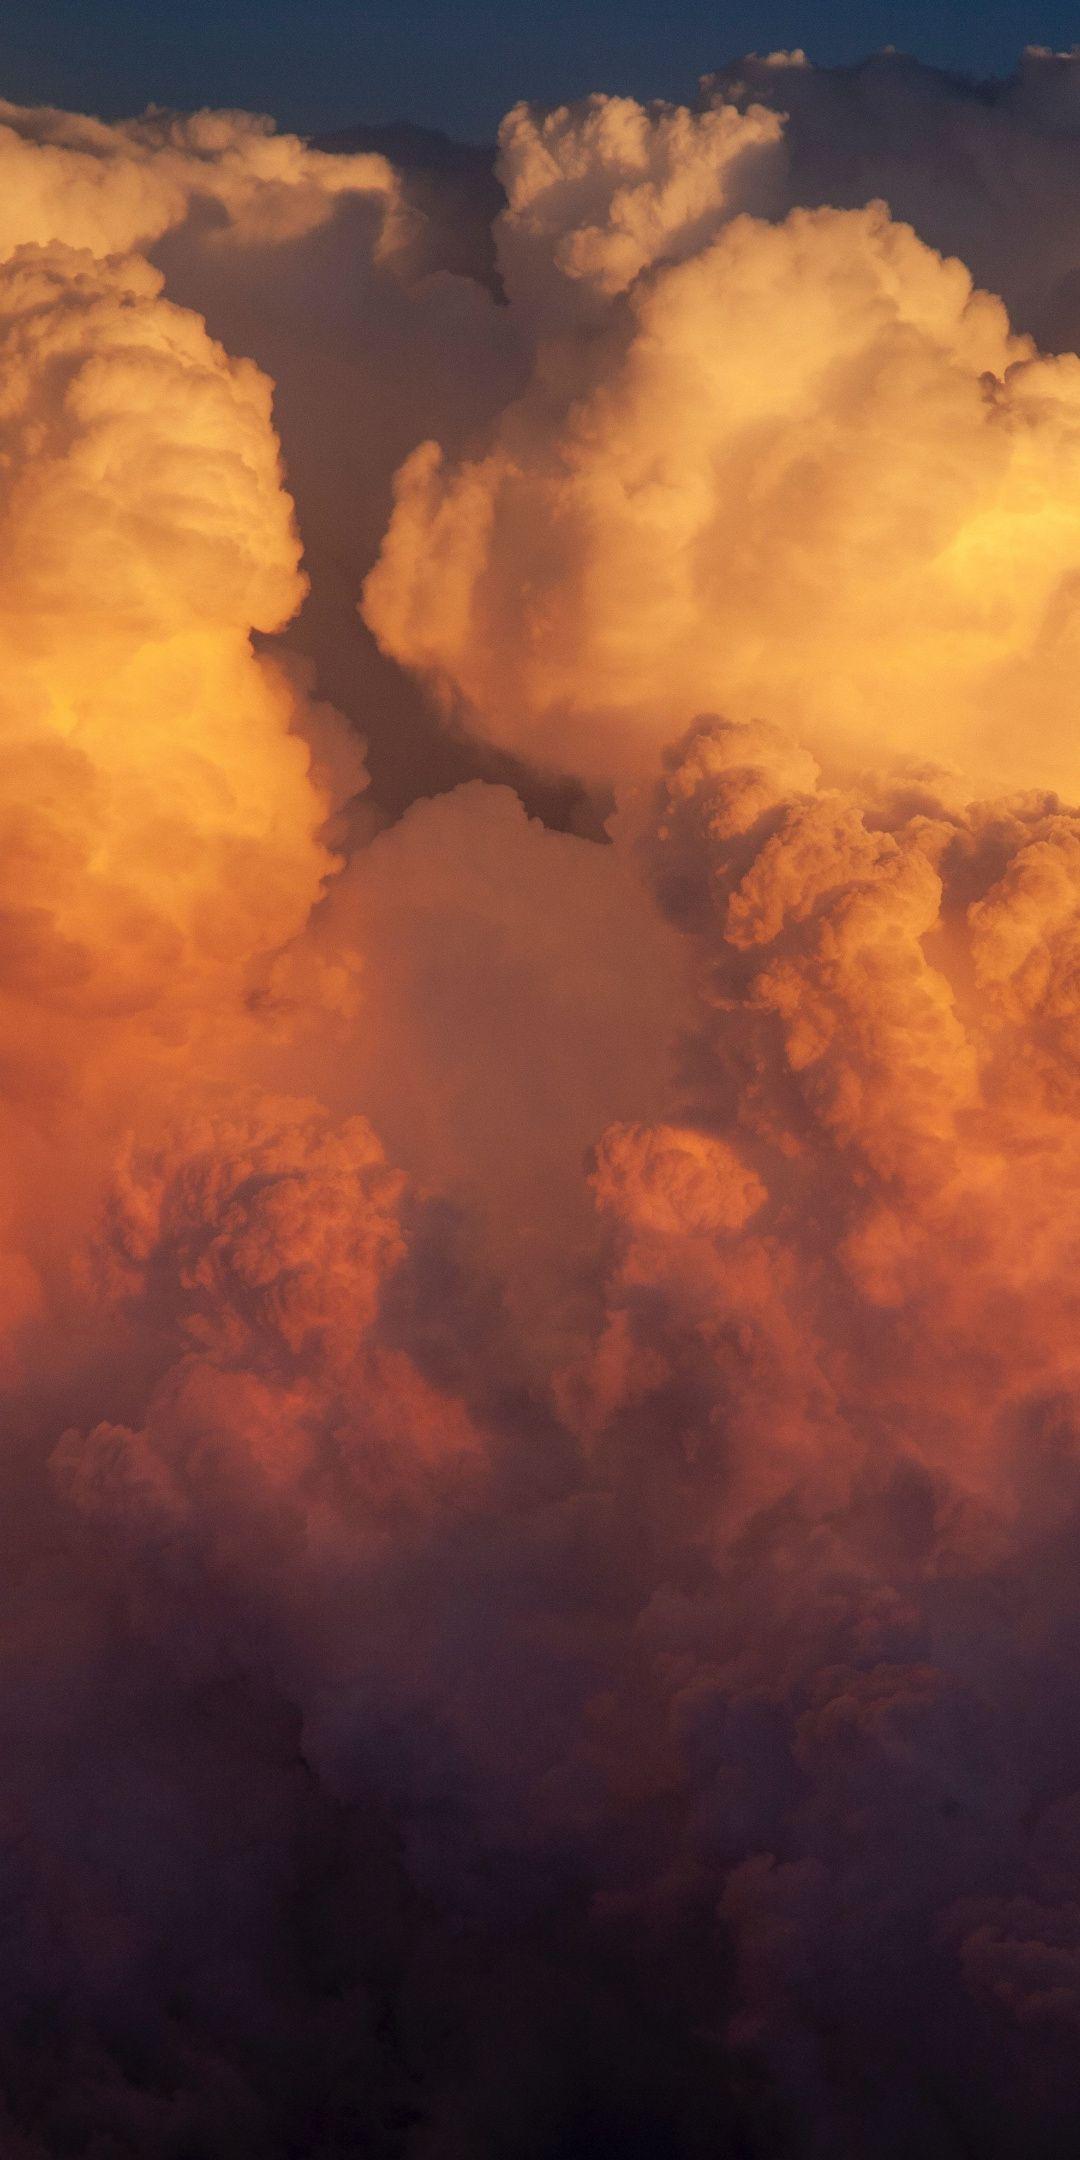 Clouds Orange Sky Wallpaper Sky Aesthetic Cloud Wallpaper